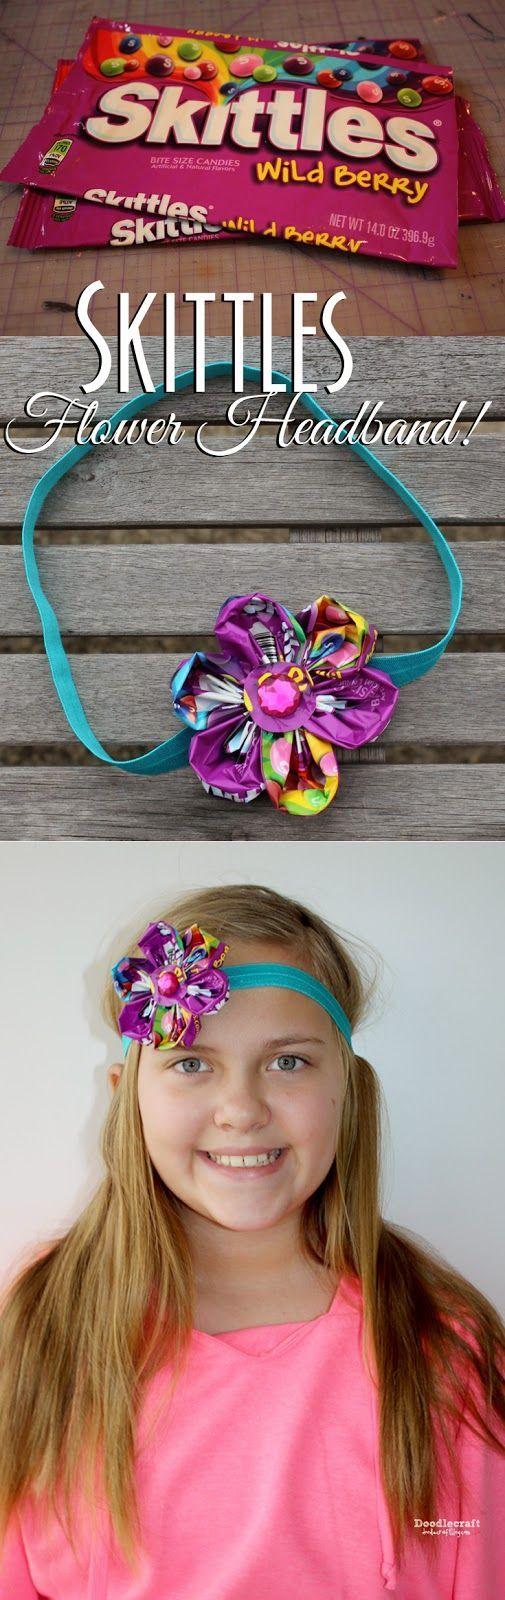 CANDY WRAPPER Skittles Flower Headband!